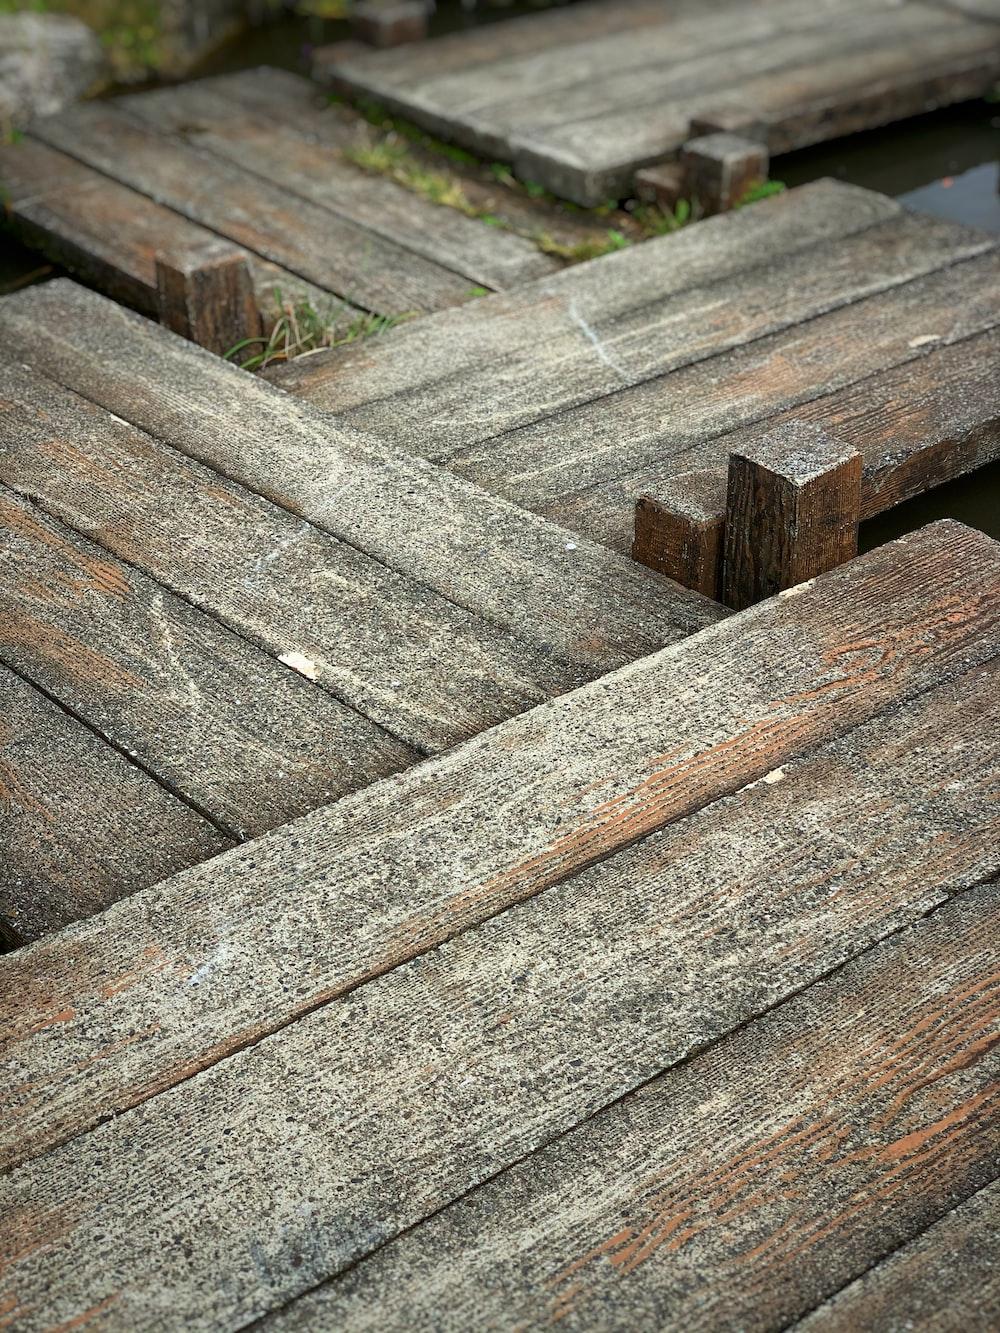 brown wooden boardwalk